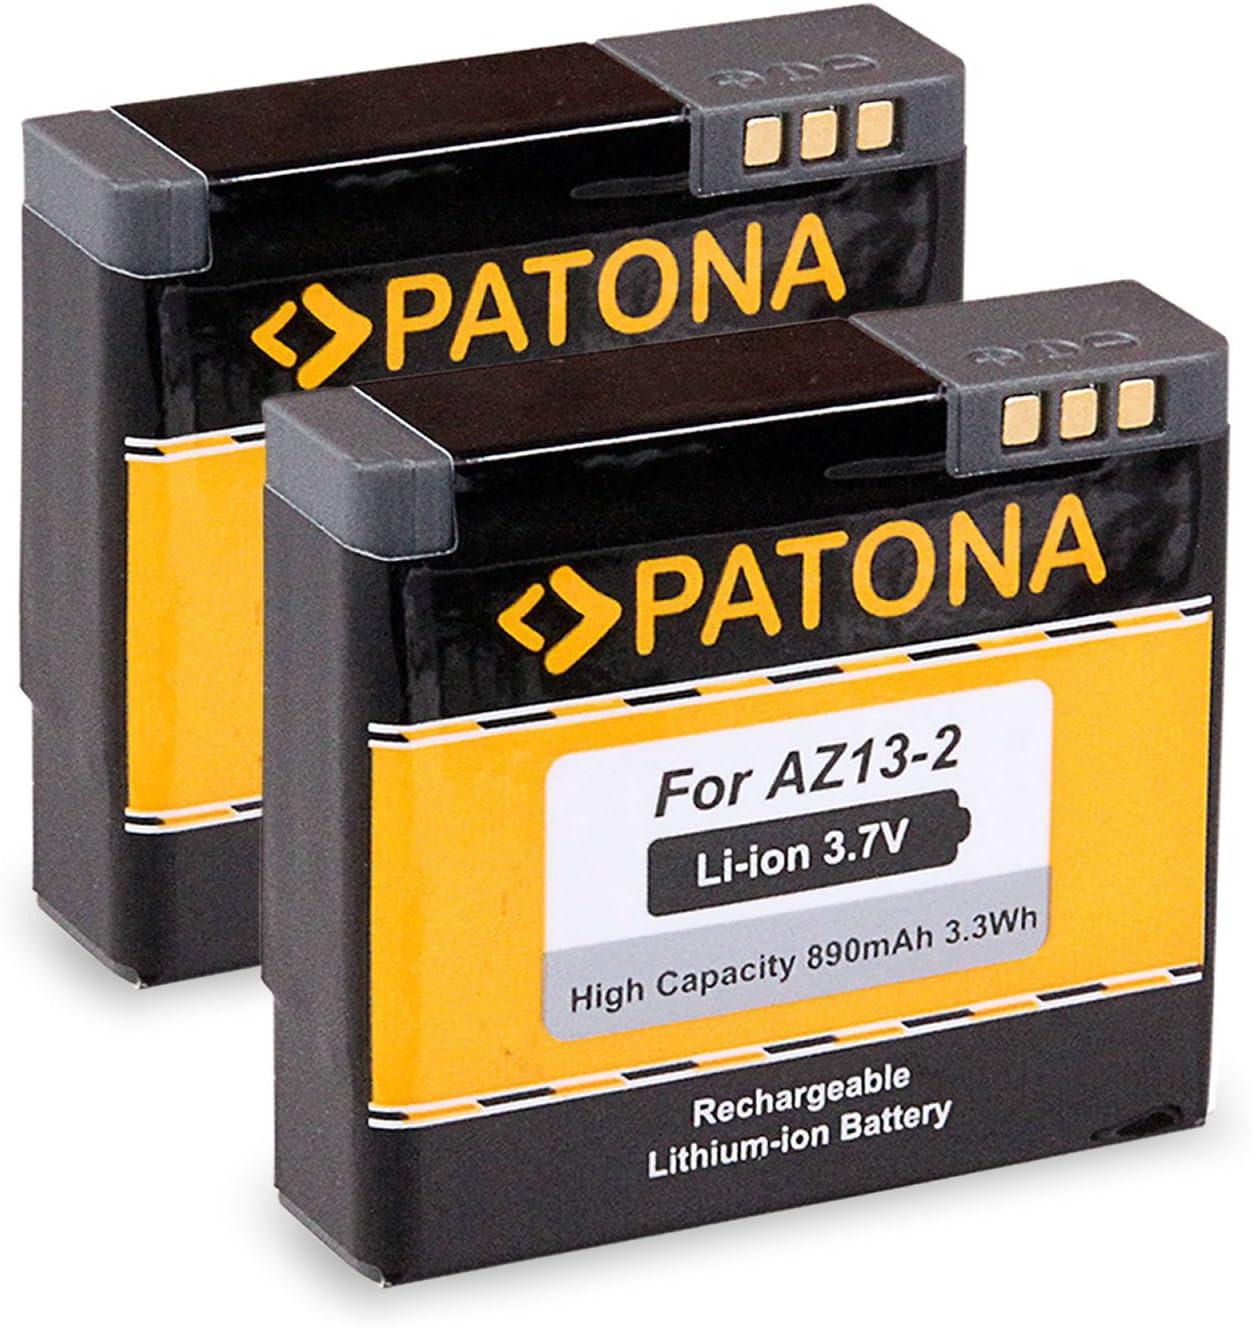 PATONA 2X Bateria AZ13-2 Compatible con Xiaomi Yi Xiaoyi YDXJO1XY, de Calidad Probada y fiable